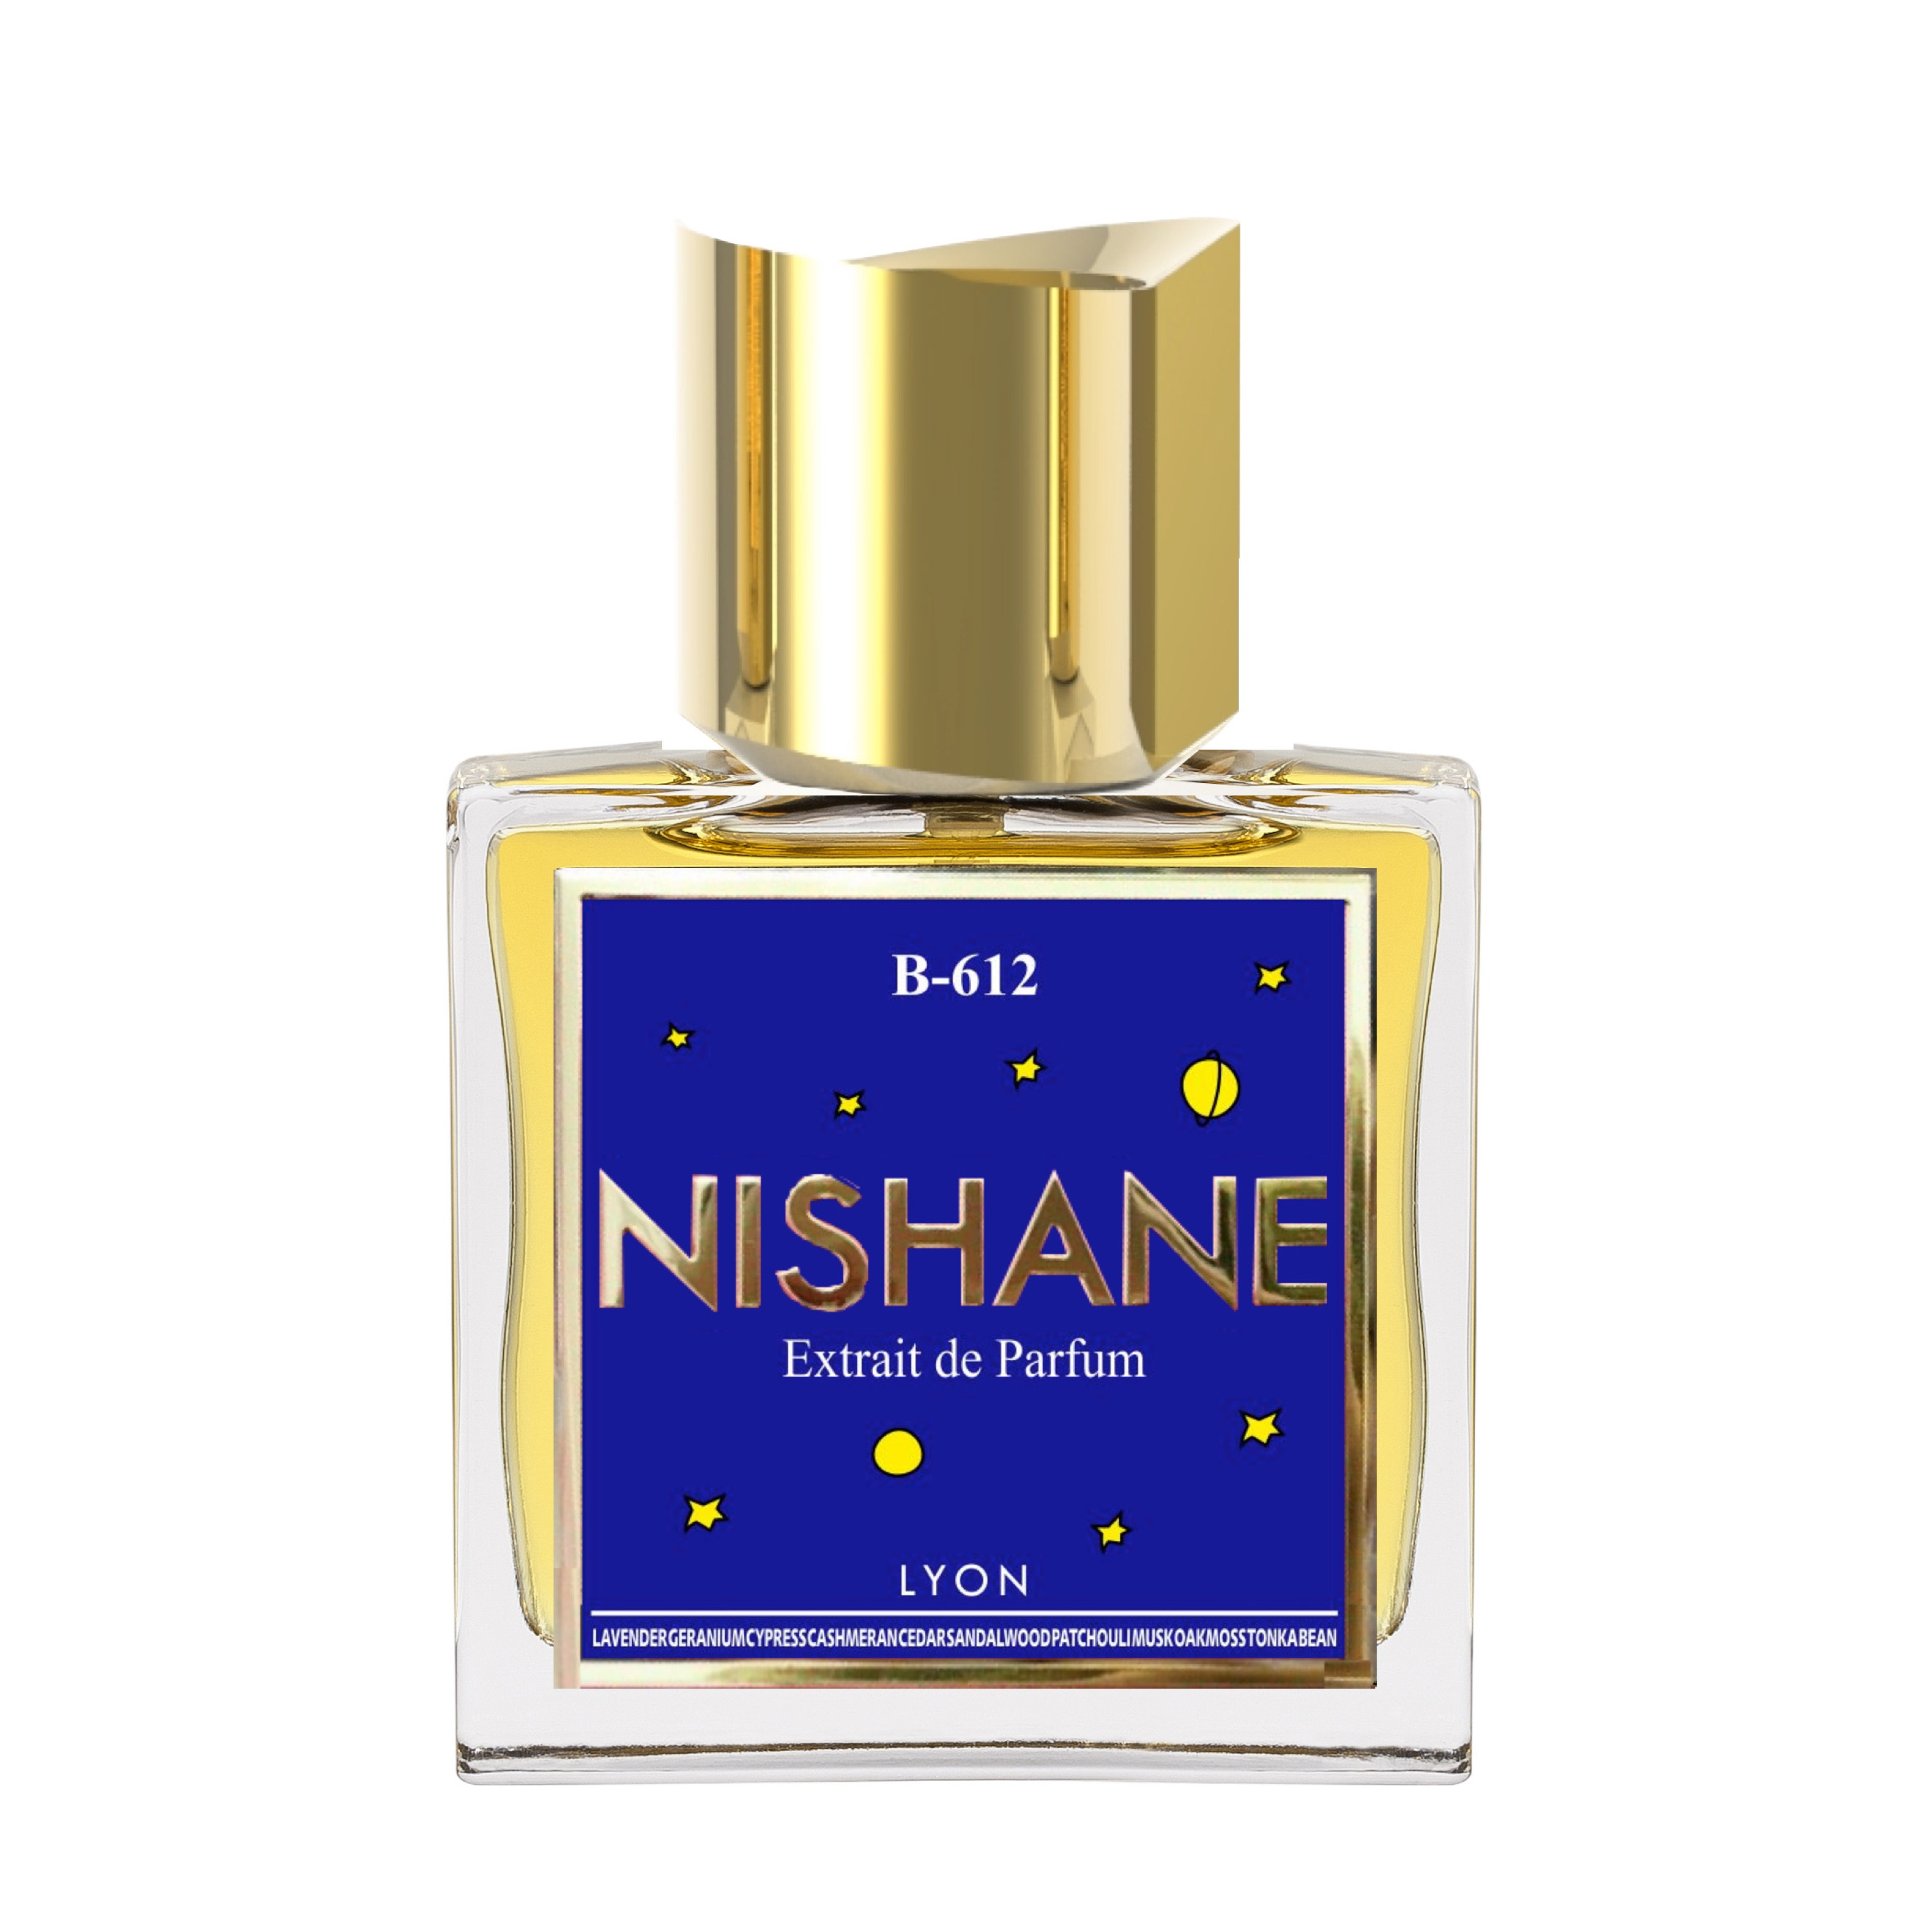 NISHANE-B-612 ExdP